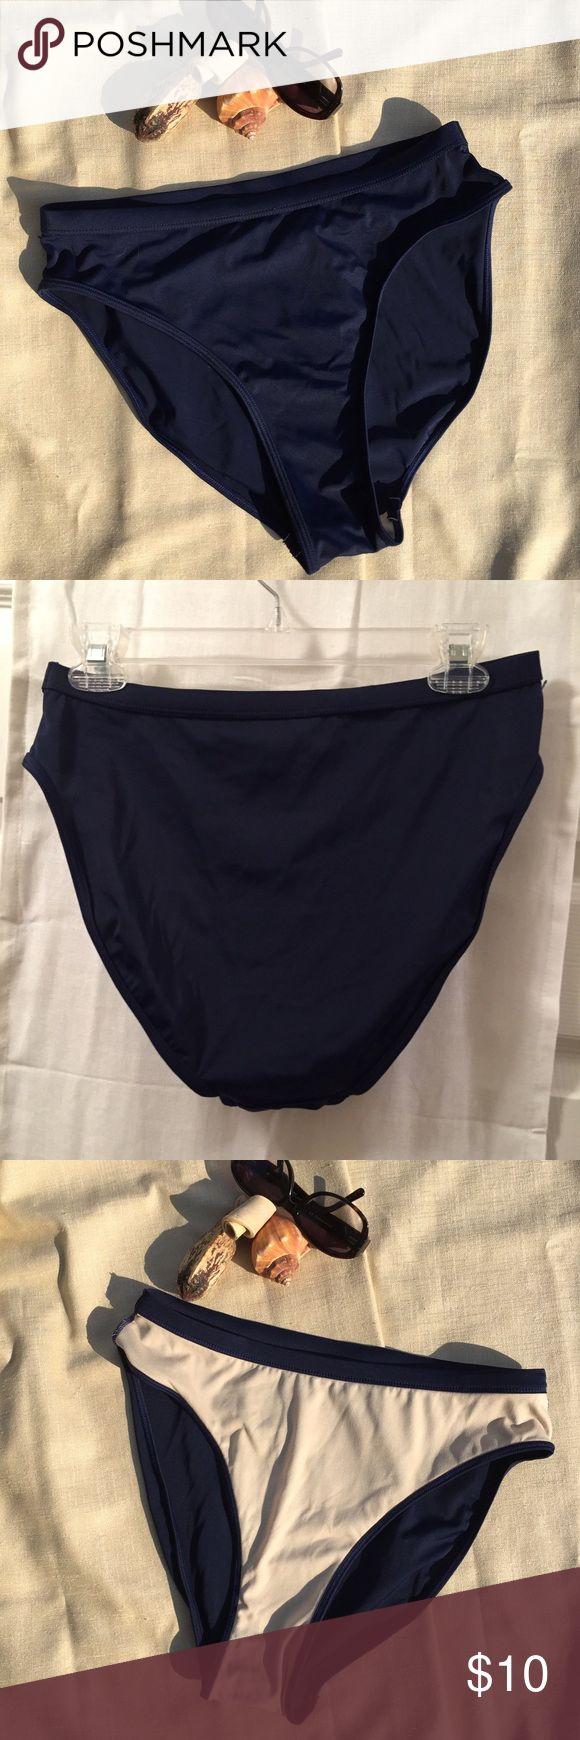 Islander brand Navy blue high-cut bikini bottom 12 Navy bikini bottom with full coverage for behind. Easy to color match. Tried on, never used. UPC: 6 6398100420, SEAS: 3005 Islander Swim Bikinis